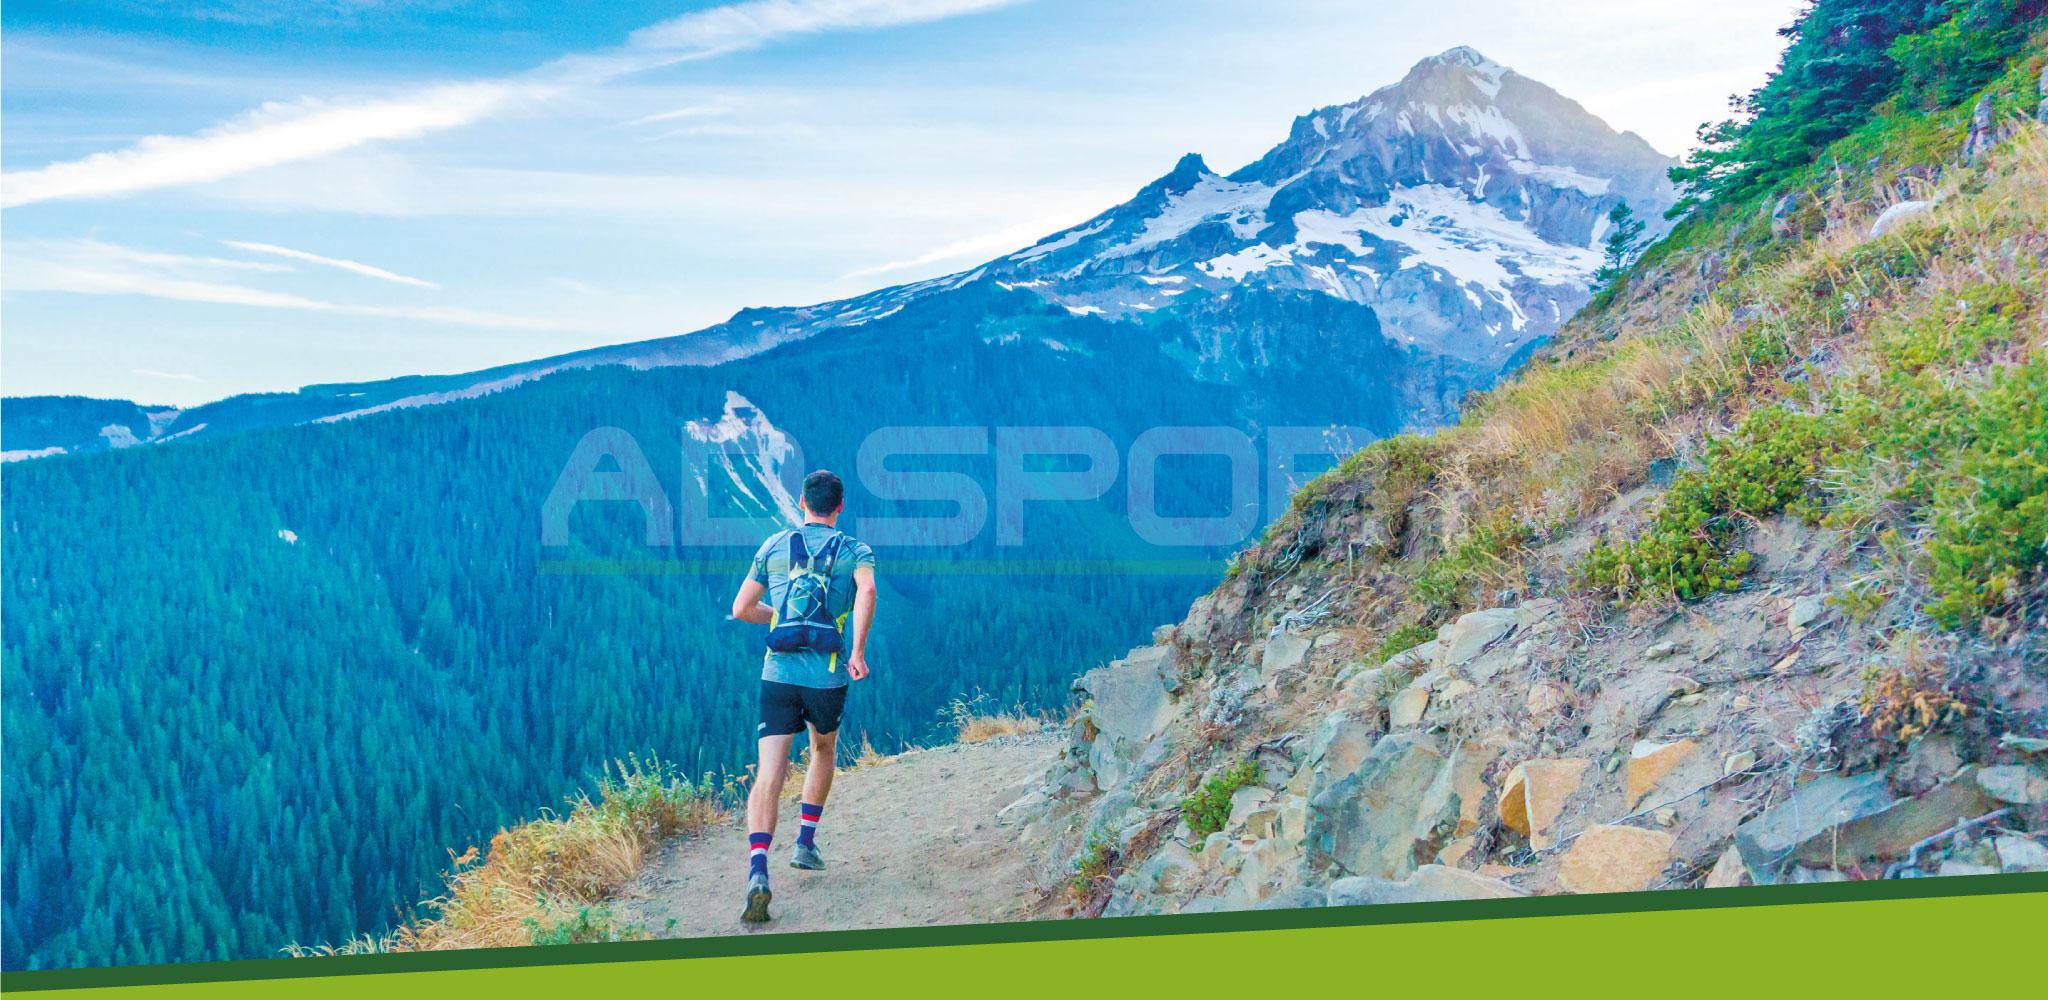 logo adsport sport articoli tecnici sportivi